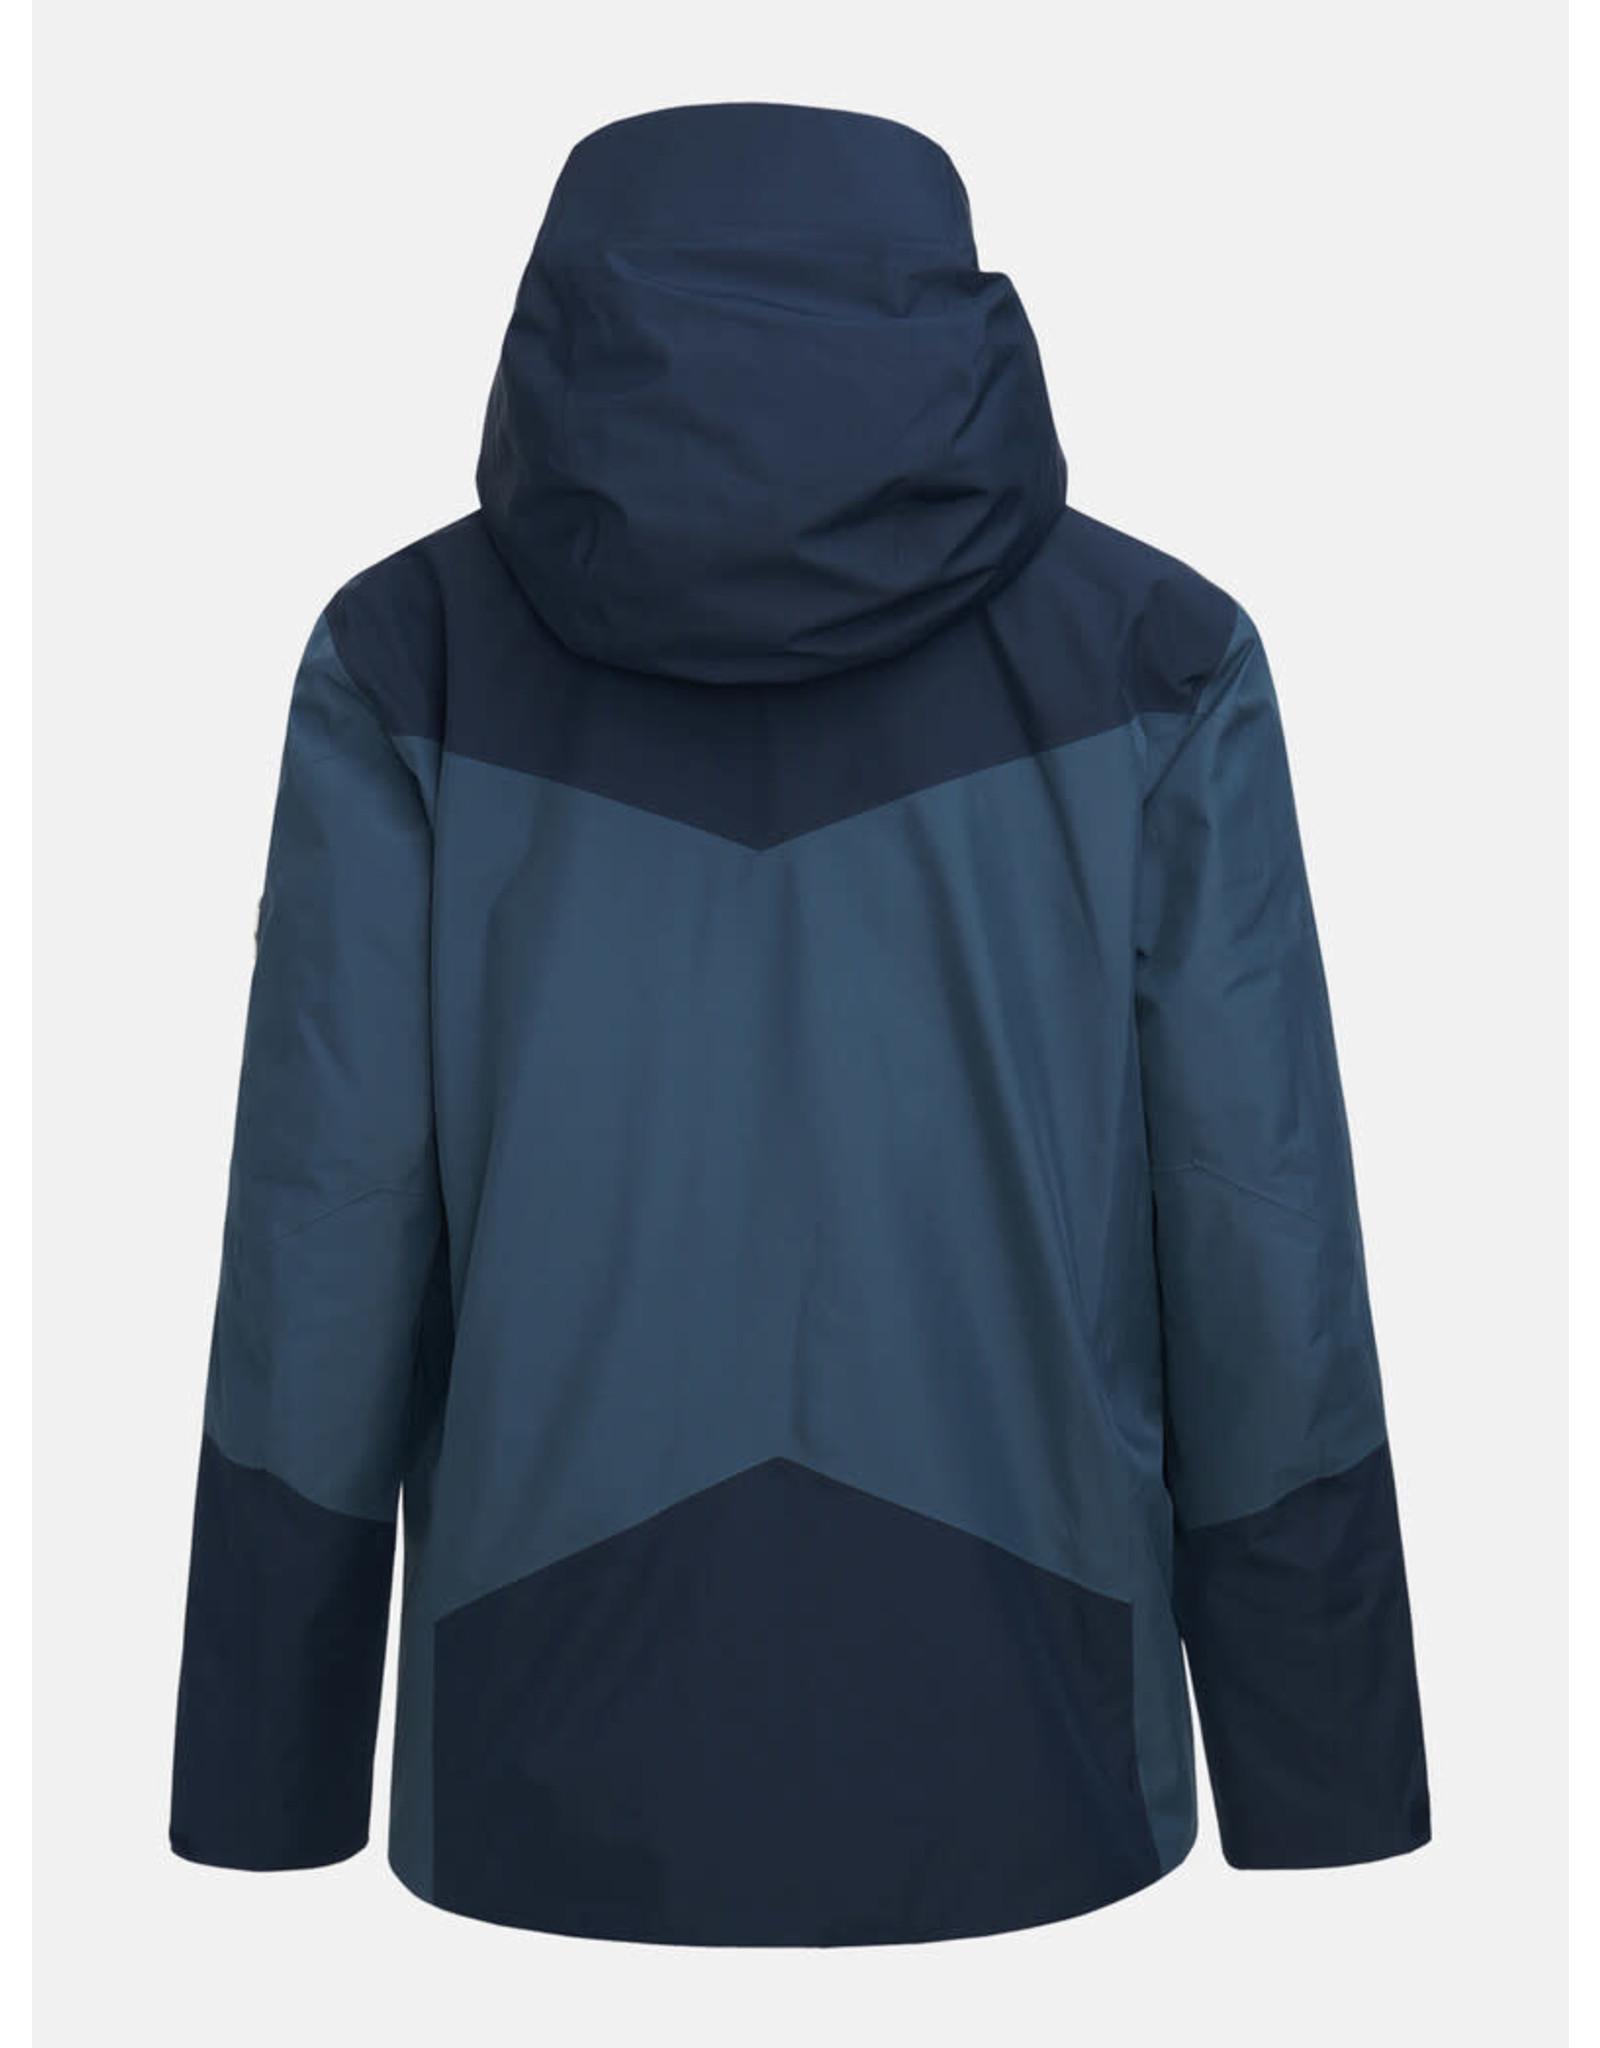 Peak Performance Maroon GTX Ski Jacket Men Size Medium